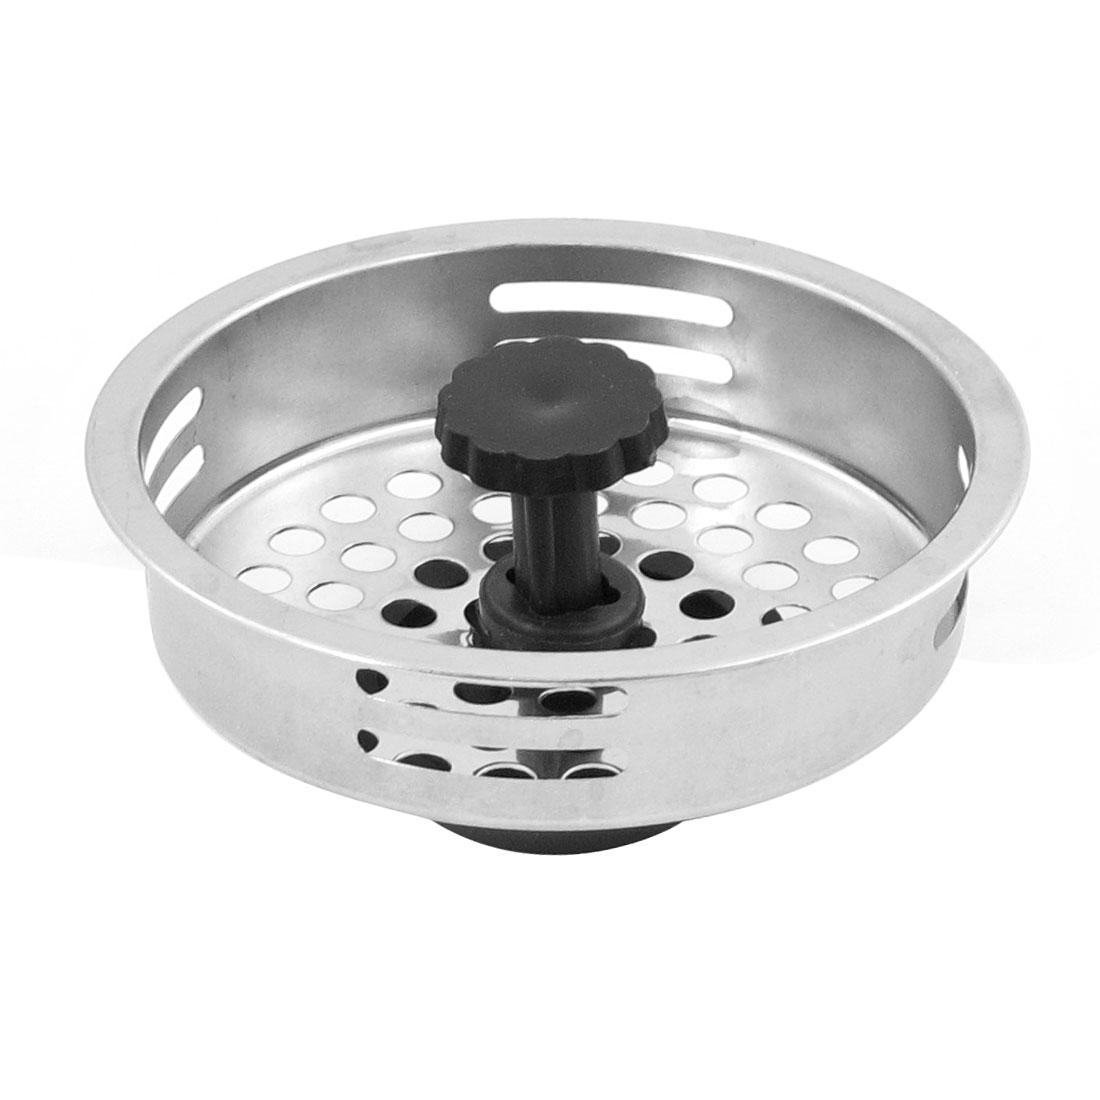 Kitchen Bathroom Mesh Hole Stainless Steel Strainer Sink Basin Filter Drain